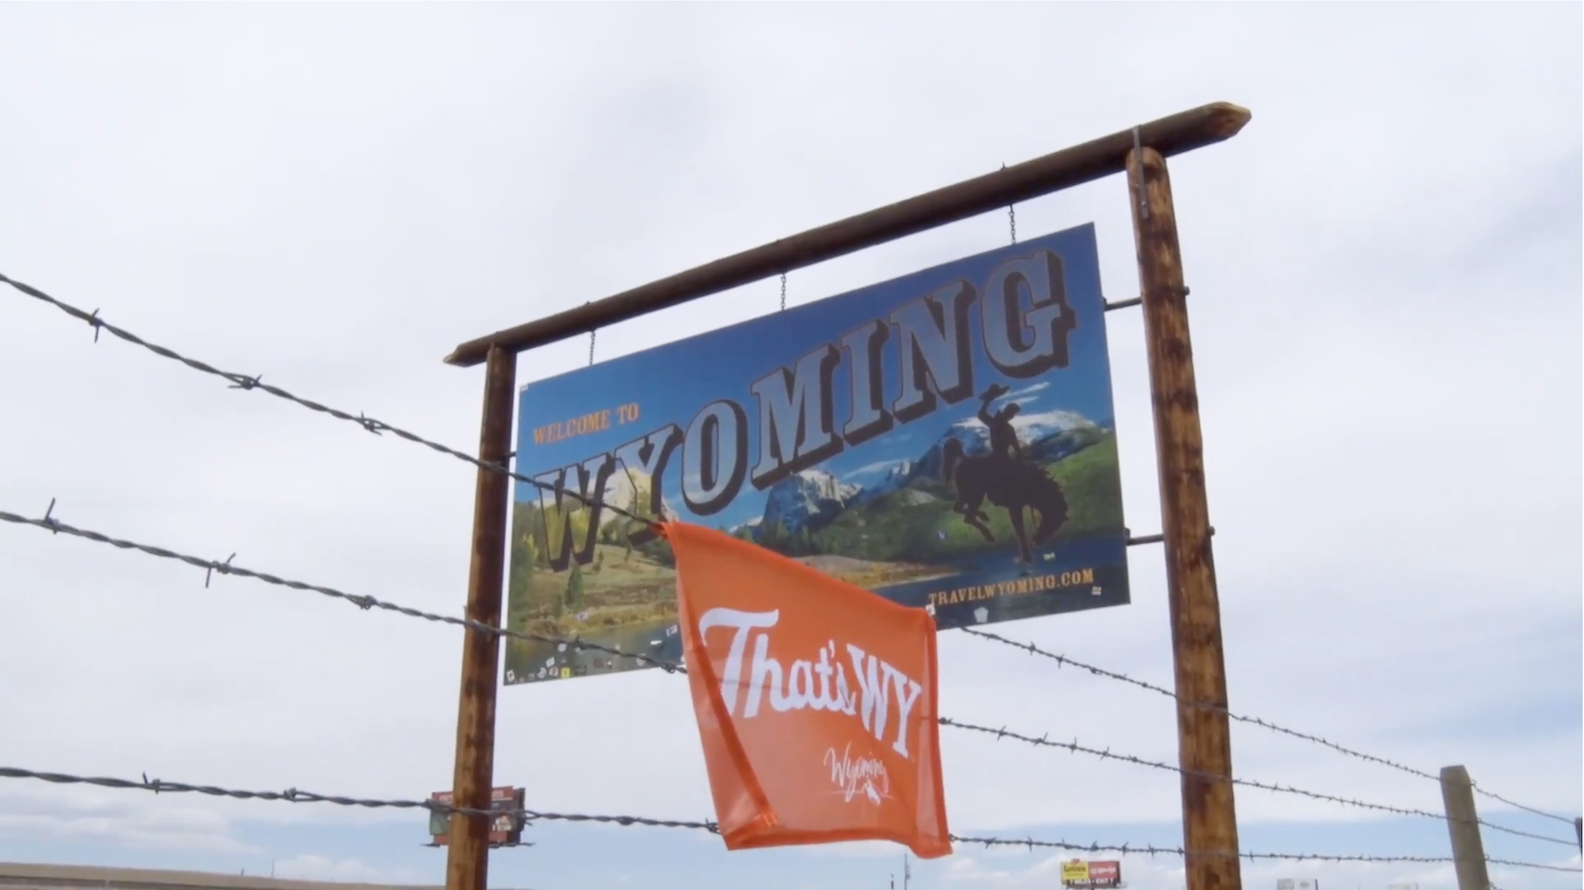 Wyoming releases 2018 travel economic impact data - Buckrail